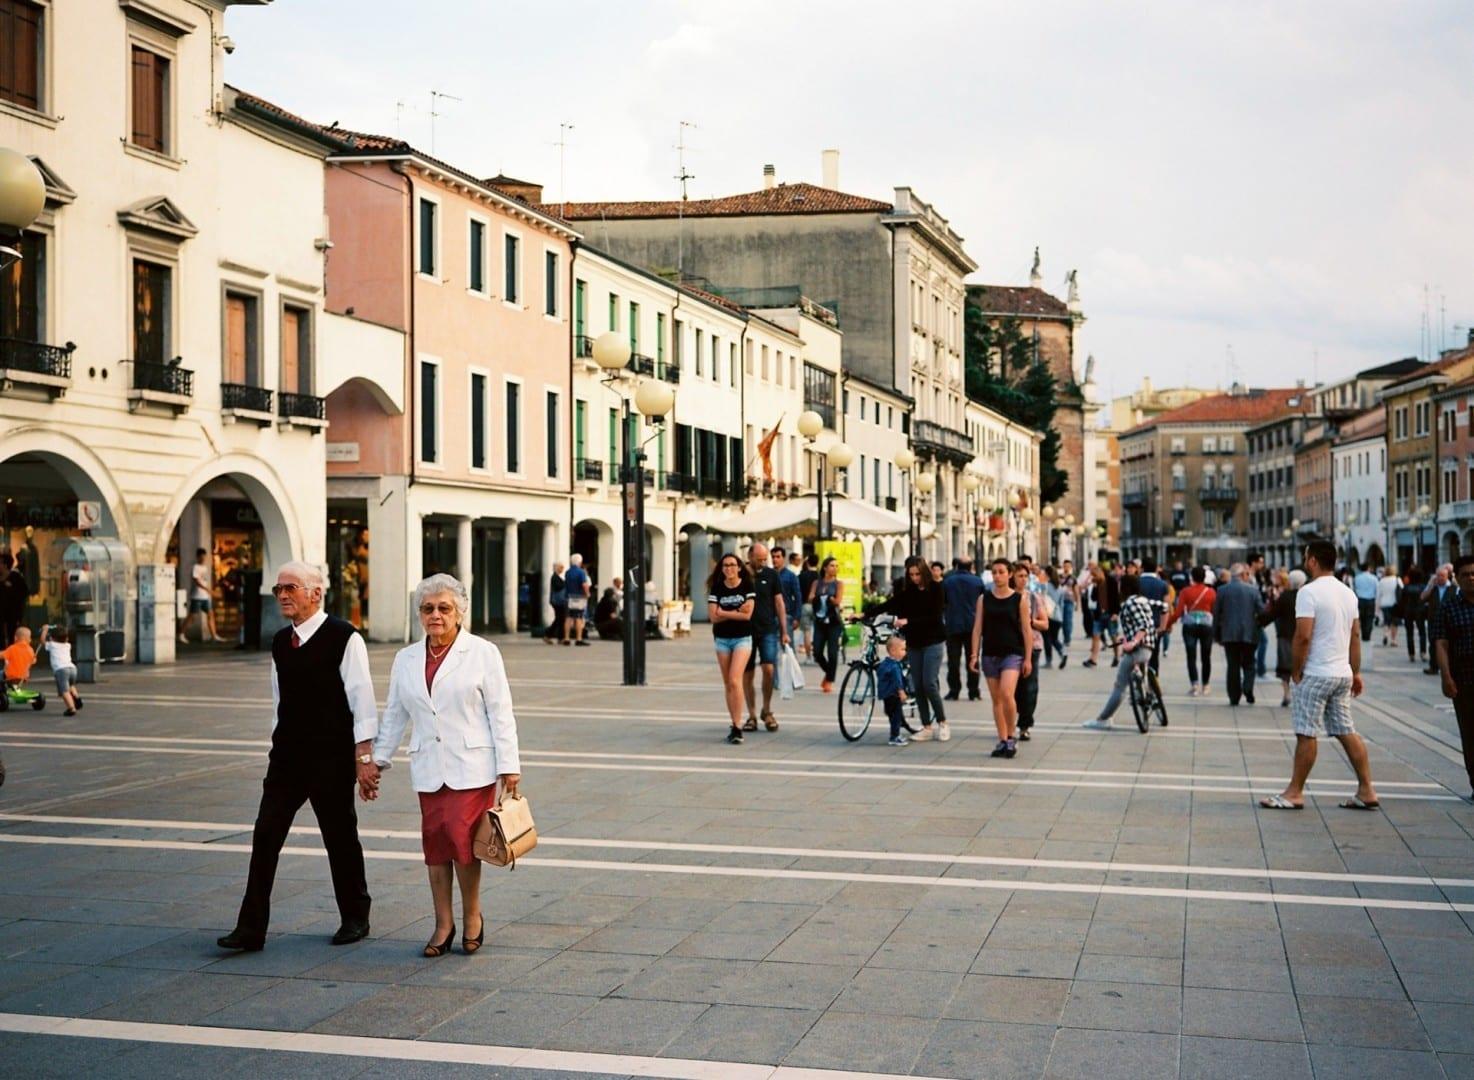 Piaza Ferretto, la principal plaza pública de Mestre. Mestre Italia